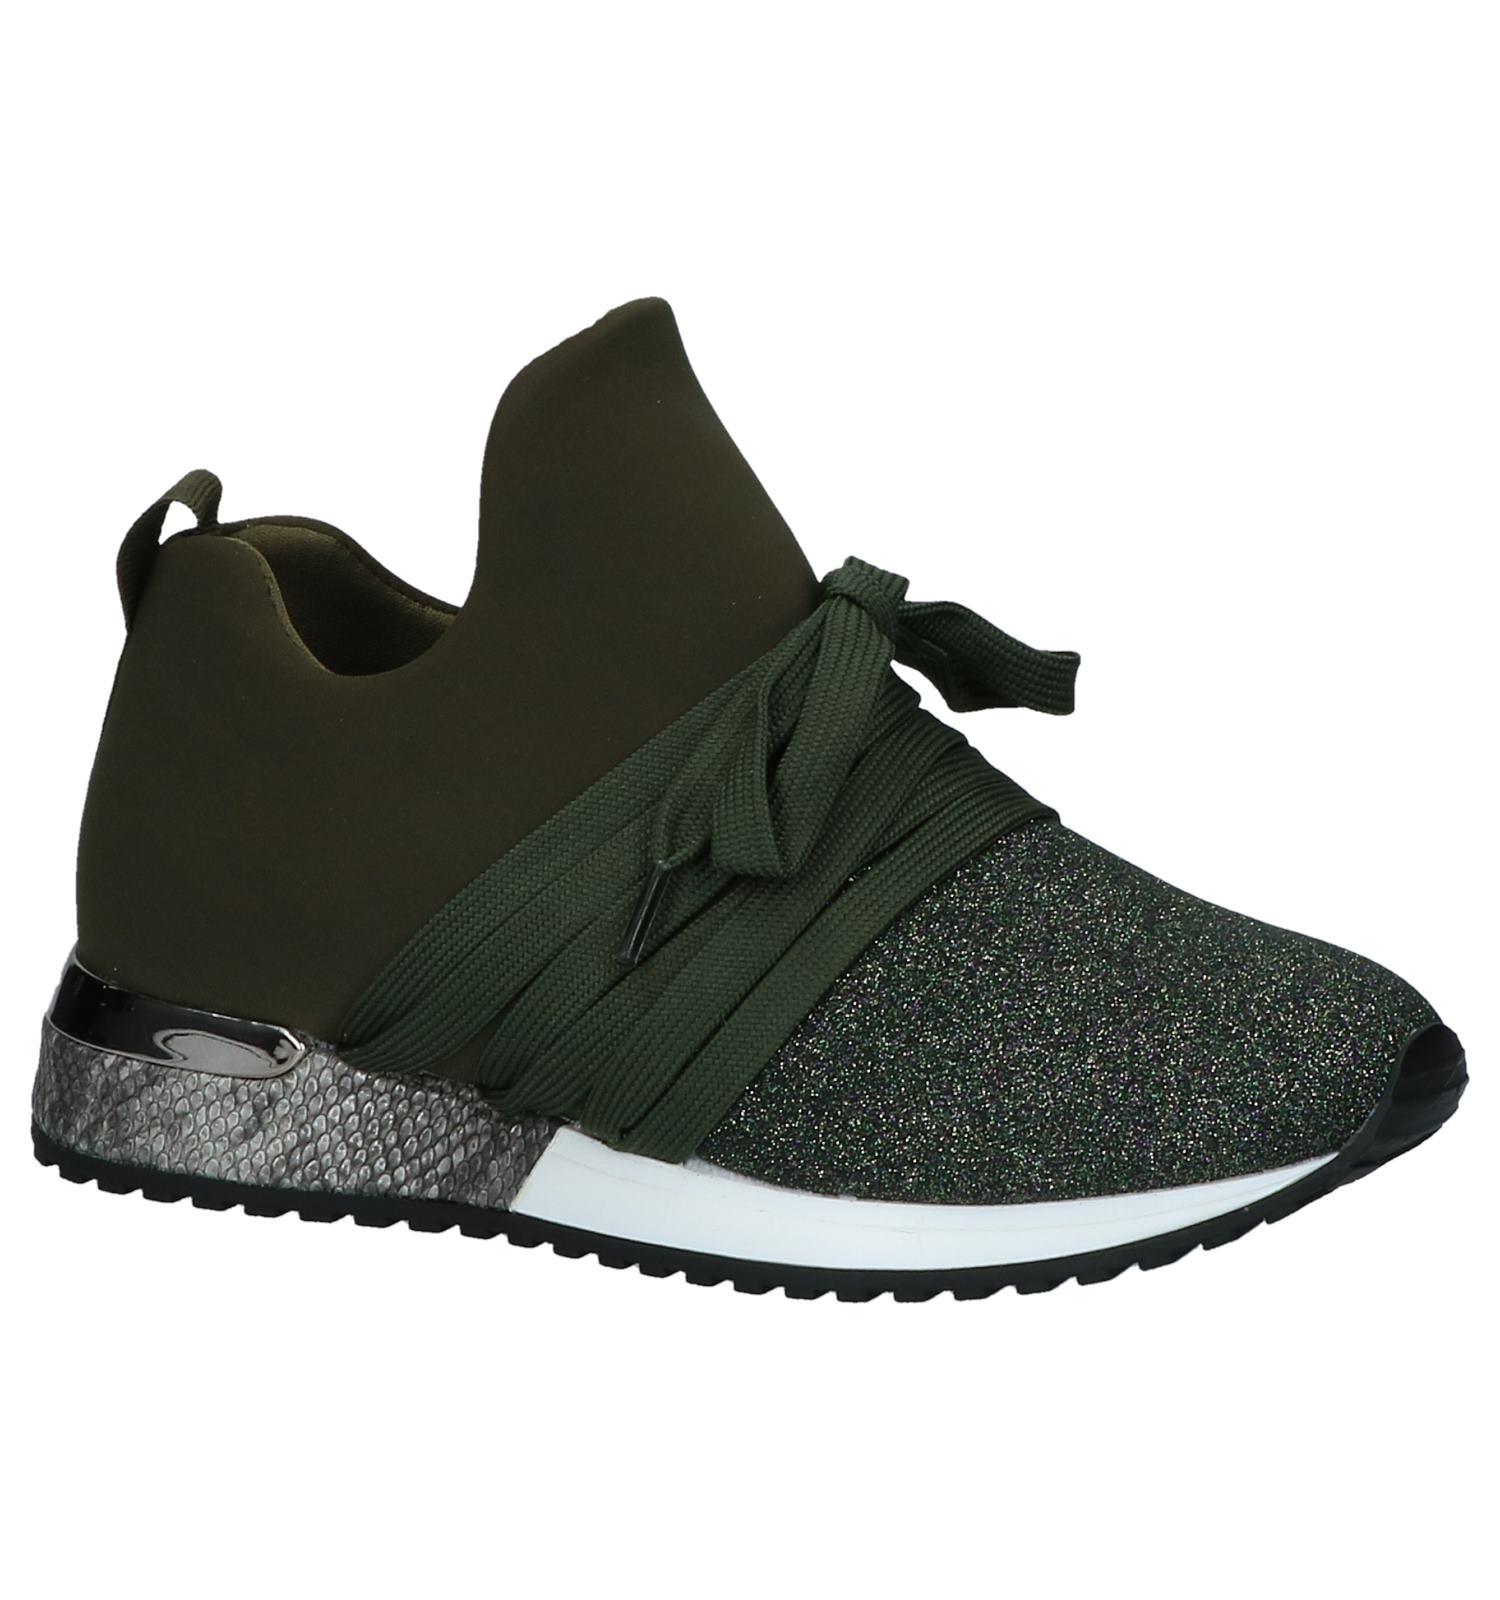 d6ee7beae72 La Strada Kaki Slip-on Sneakers | TORFS.BE | Gratis verzend en retour